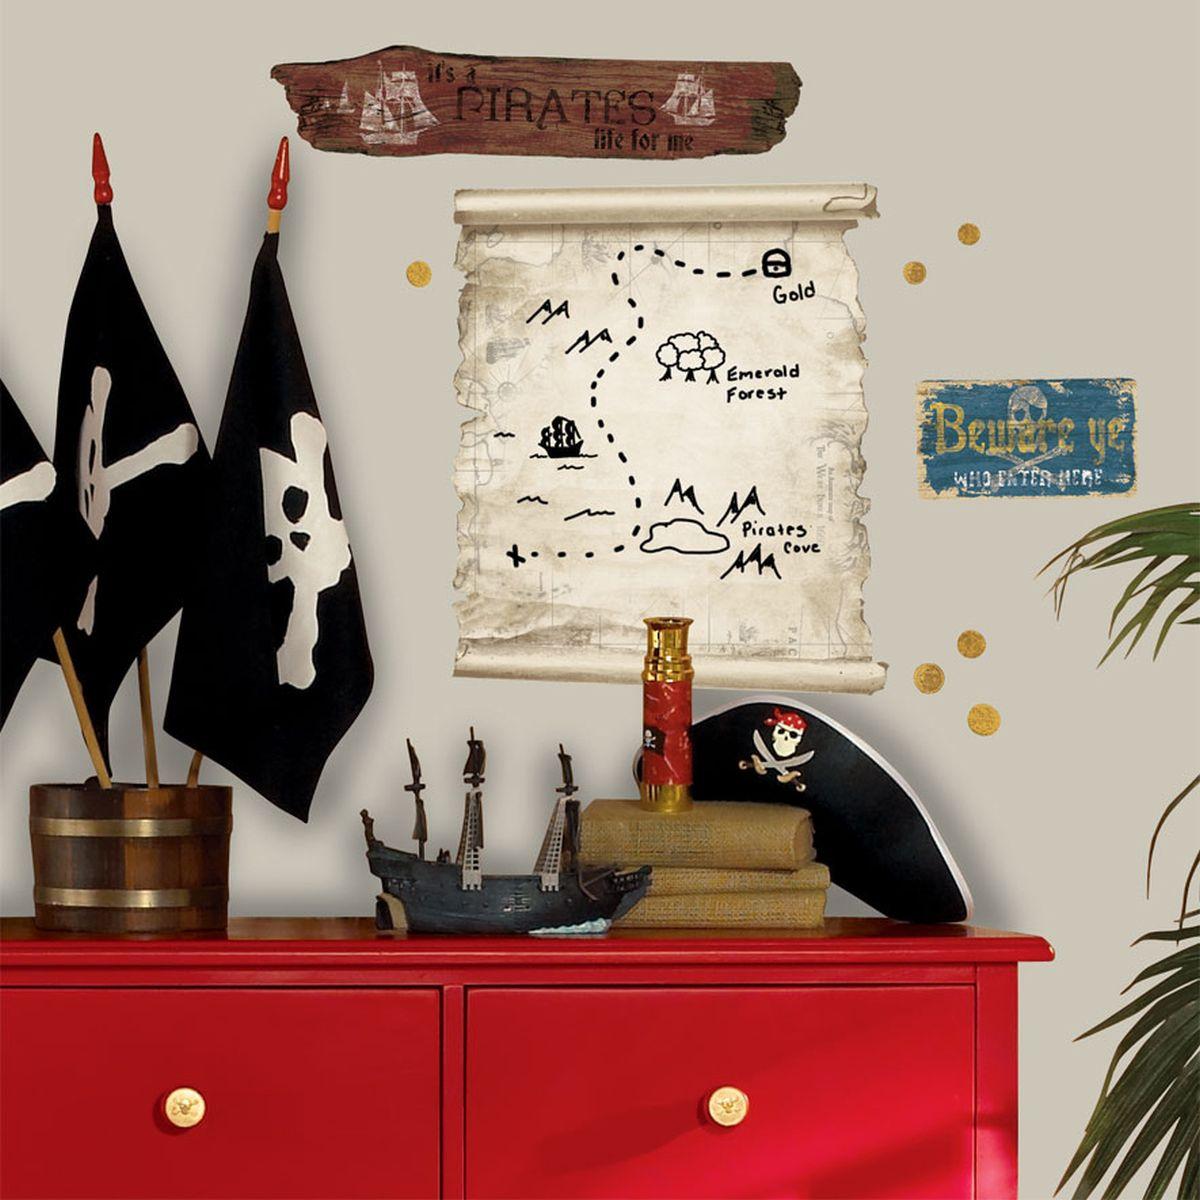 Full Size of Piraten Schatzkarte Holzschilder Whiteboard Wandsticker Sofa Kinderzimmer Regale Regal Weiß Kinderzimmer Piraten Kinderzimmer